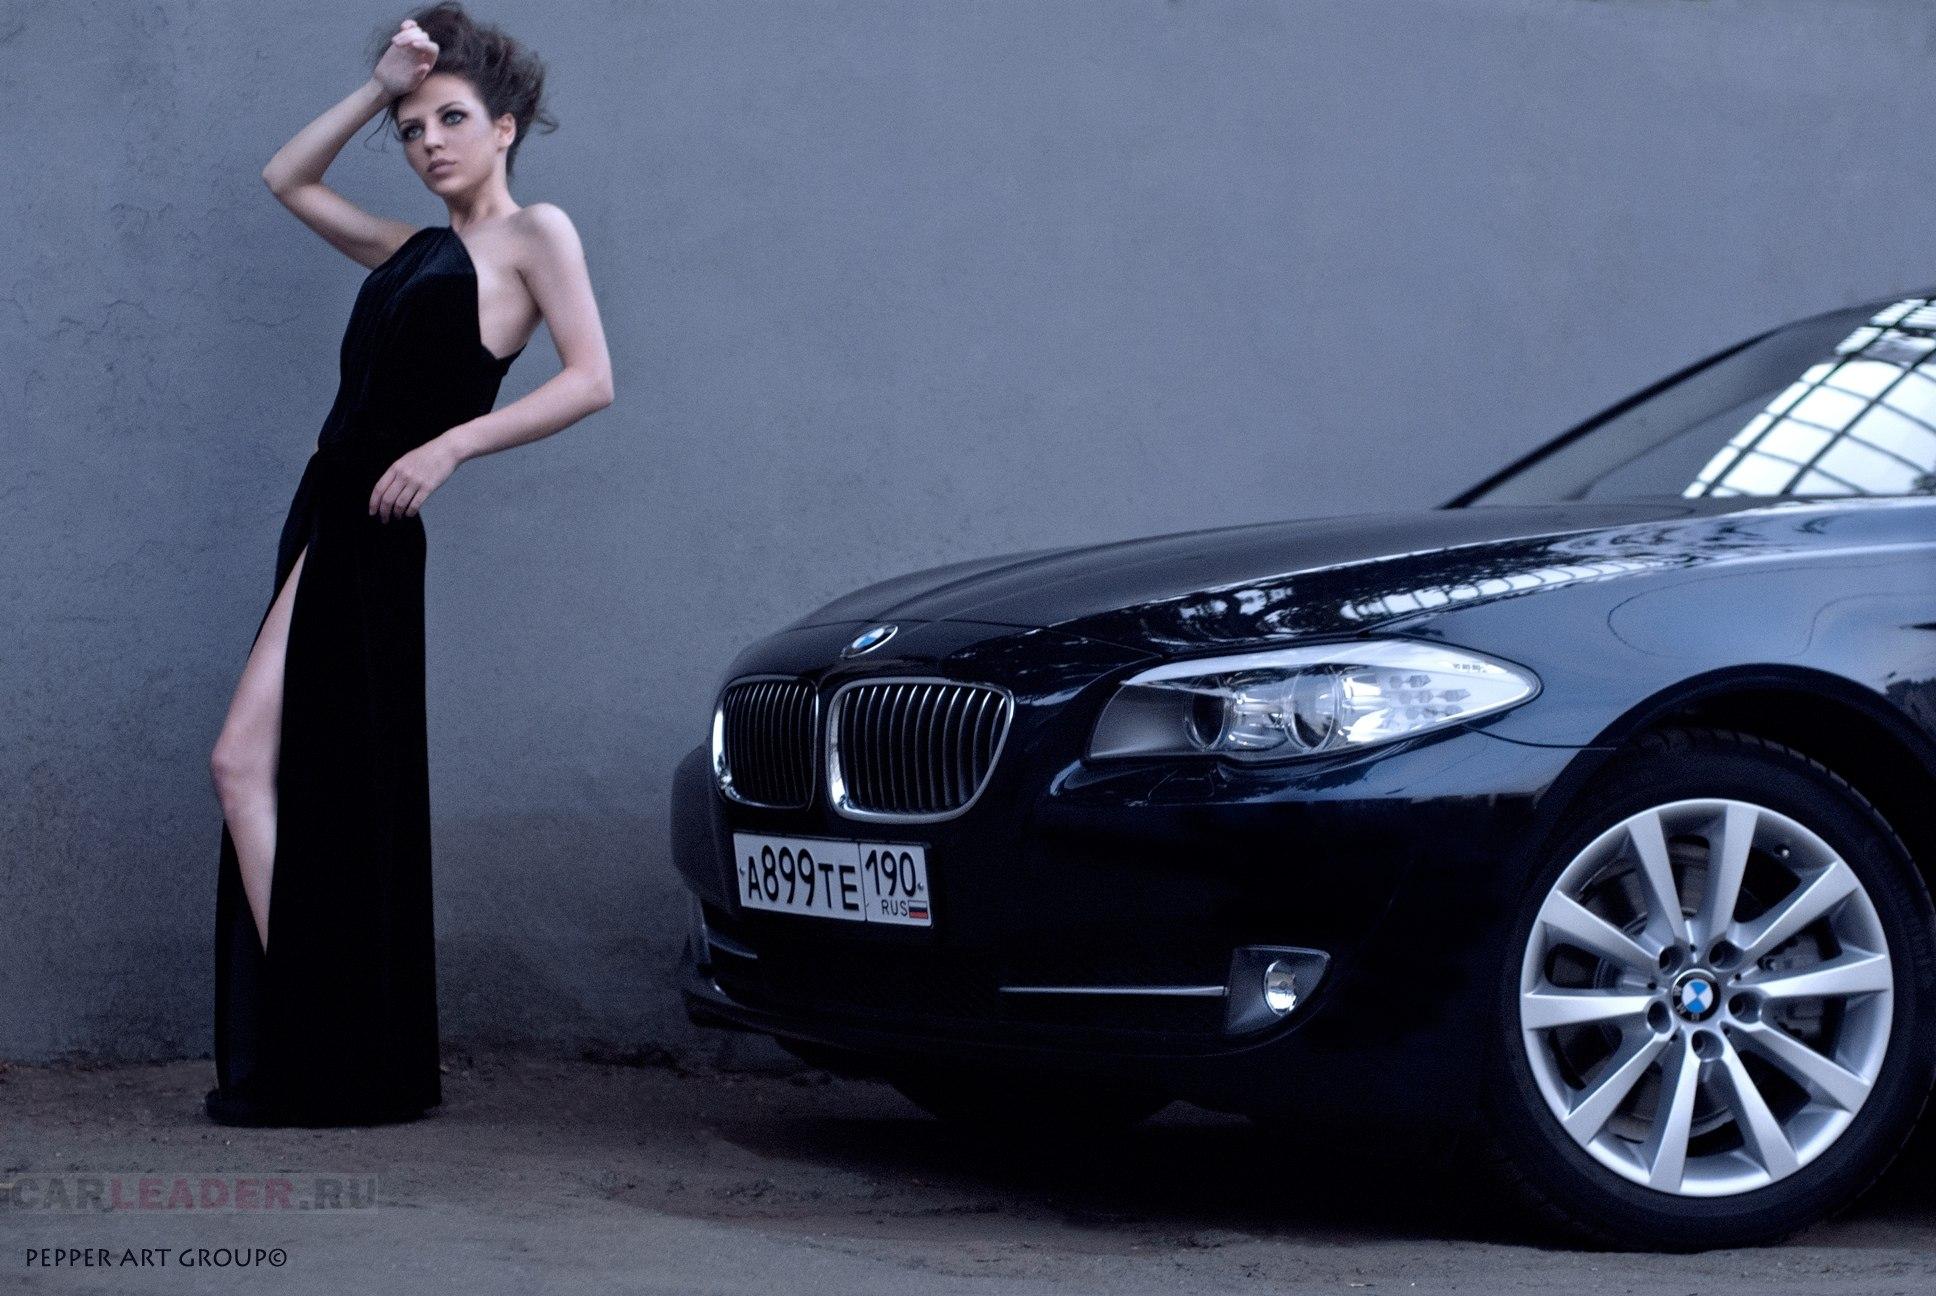 BMW 528 i 2012 Car leader